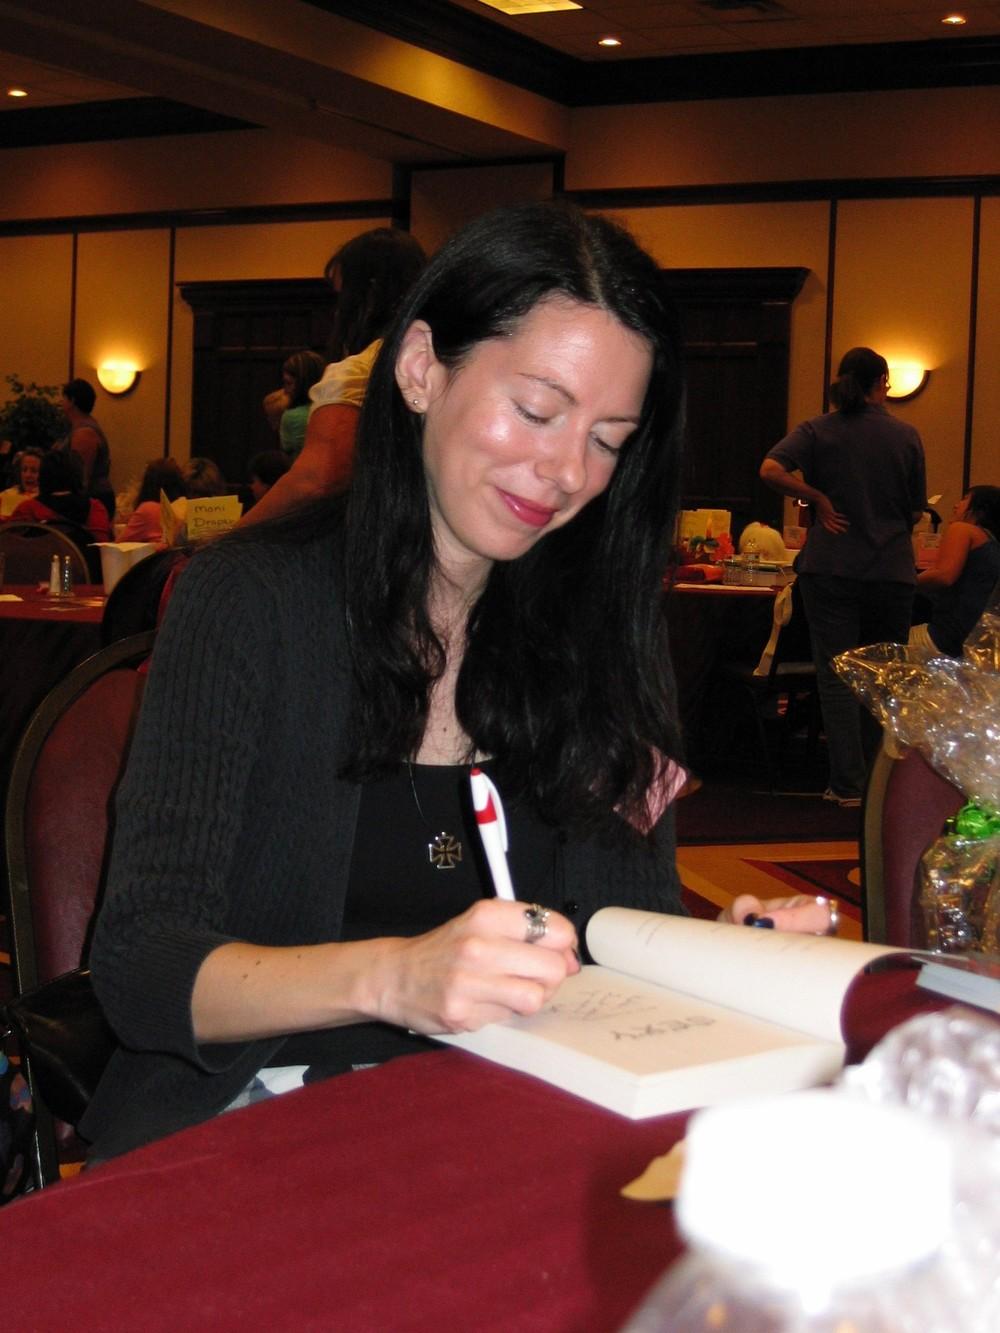 Lori Foster Event 2009 007.jpg